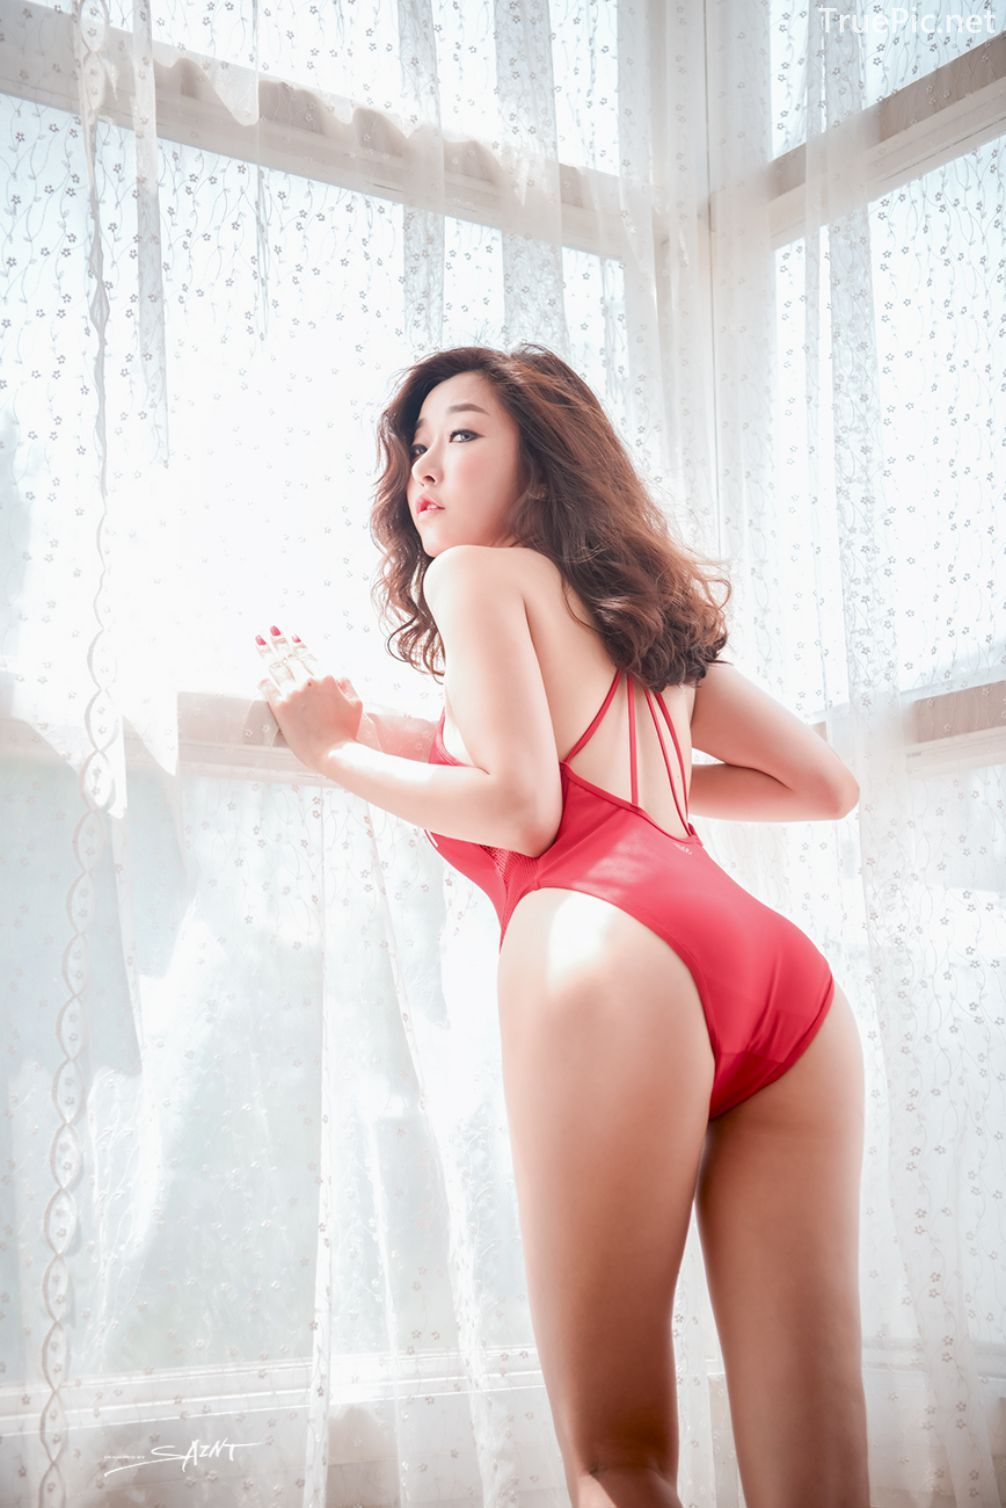 Korean-model-Oh-Haru-Sexy-Indoor-Photoshoot-Collection-TruePic.net- Picture-6